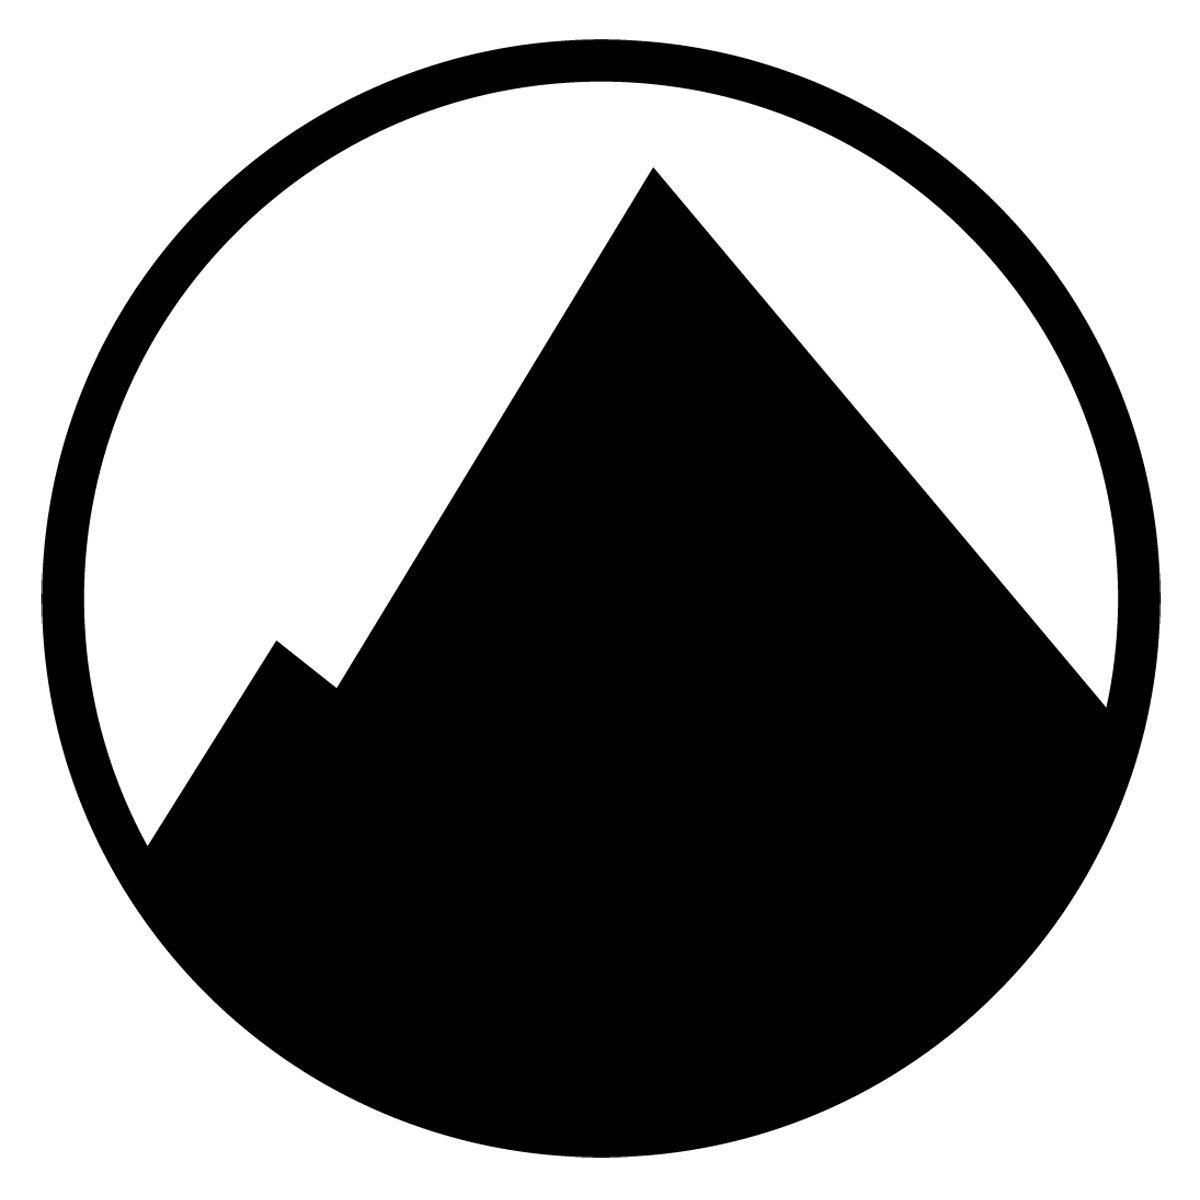 pic 001 - Erased Tapes Symbol.jpg